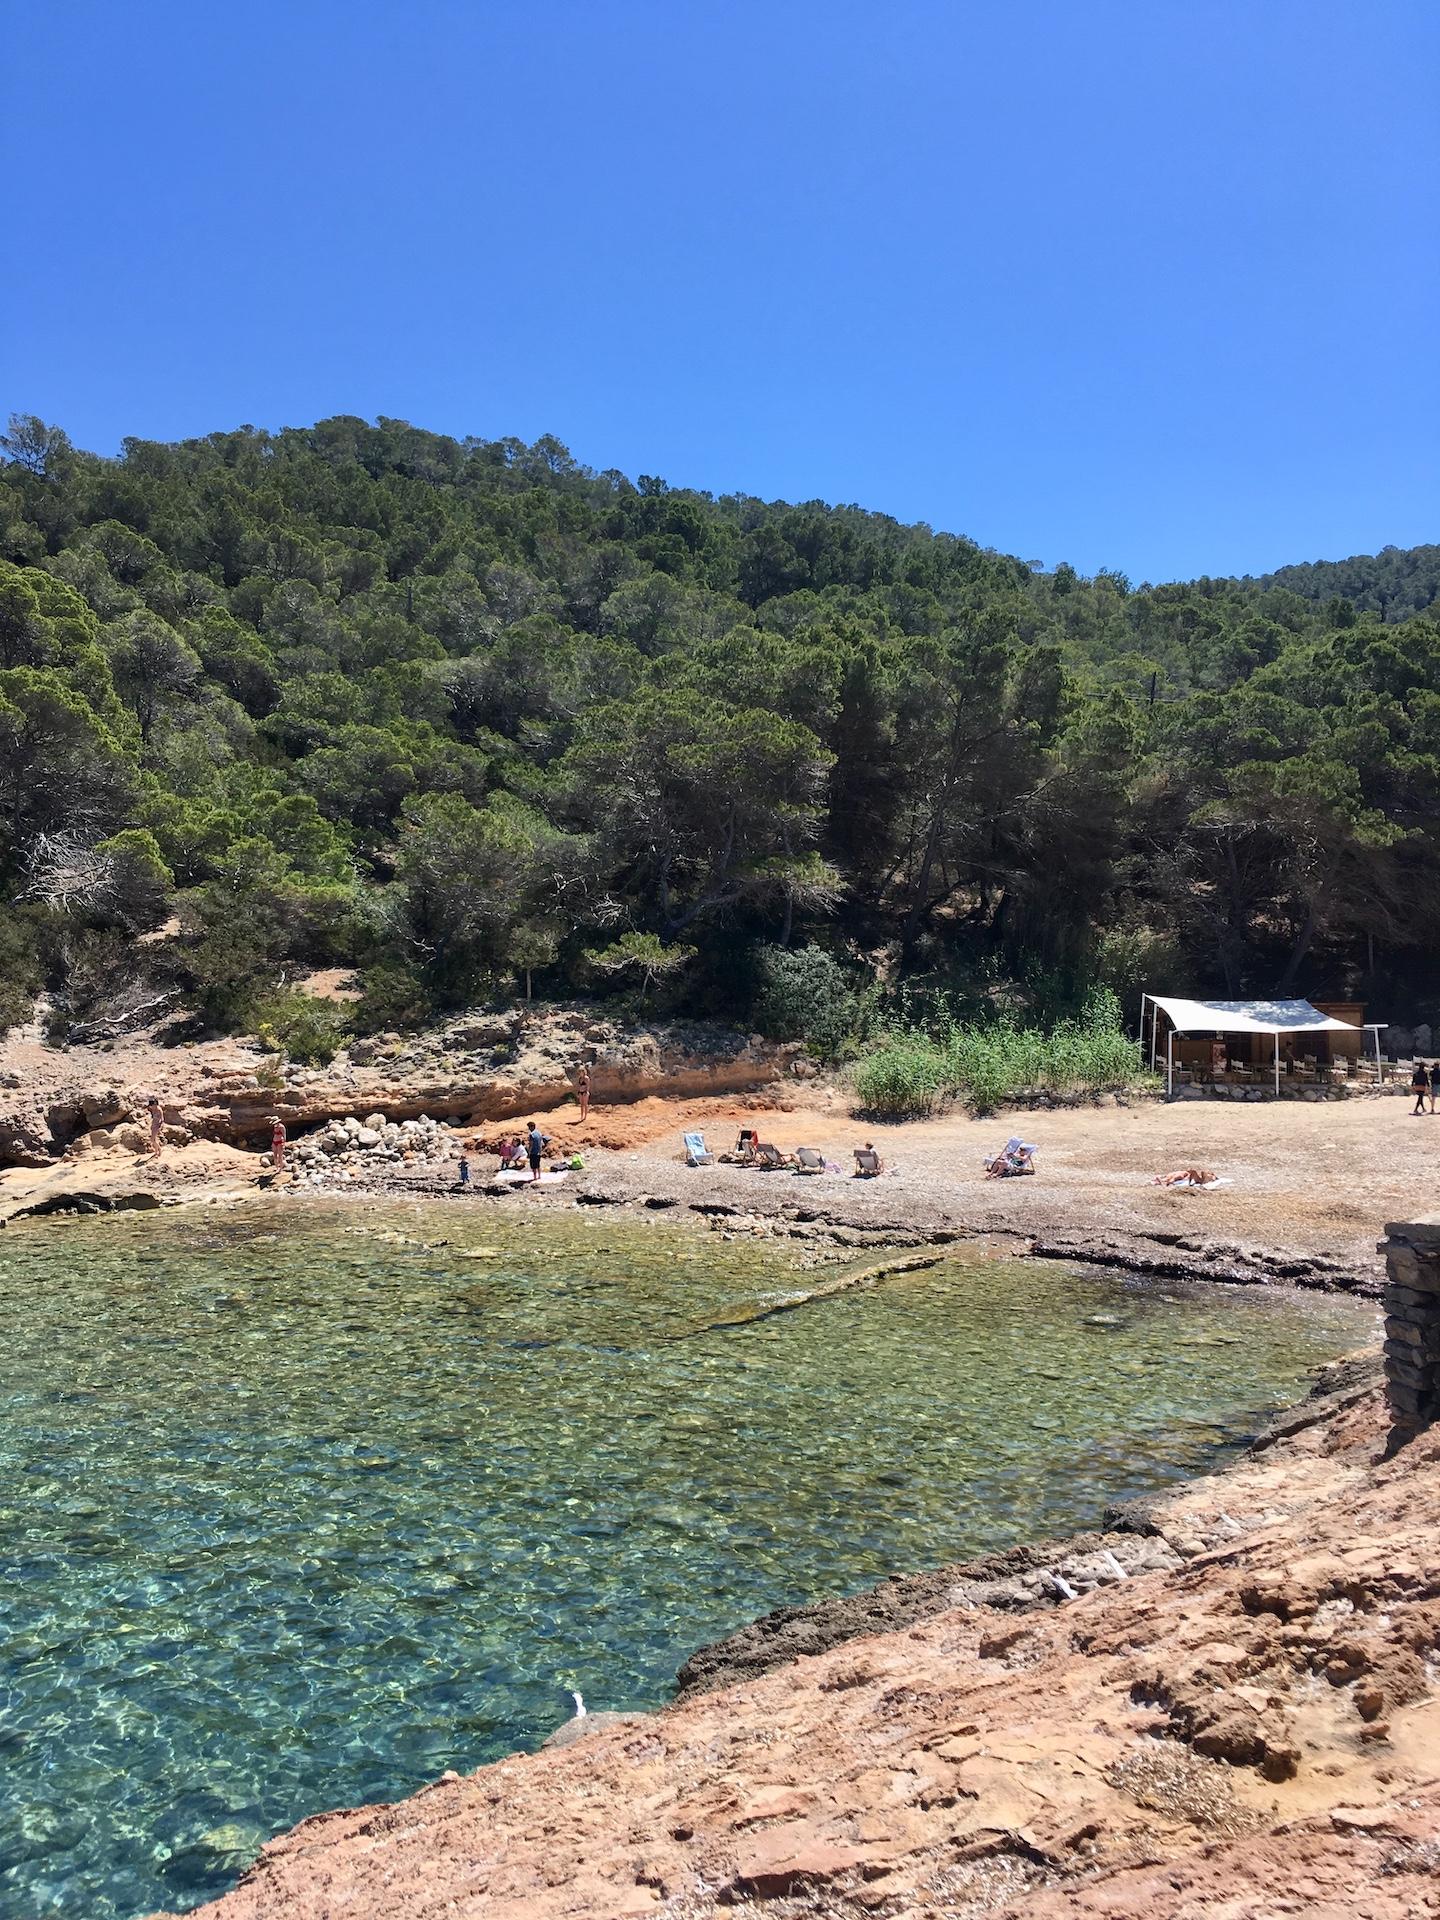 Cala Xuclar - wunderschöne Natur-Bucht in Ibizas Norden #Ibiza #Urlaub #Strand #Geheimtipp #Schnorcheln #Kajak #SUP.jpg